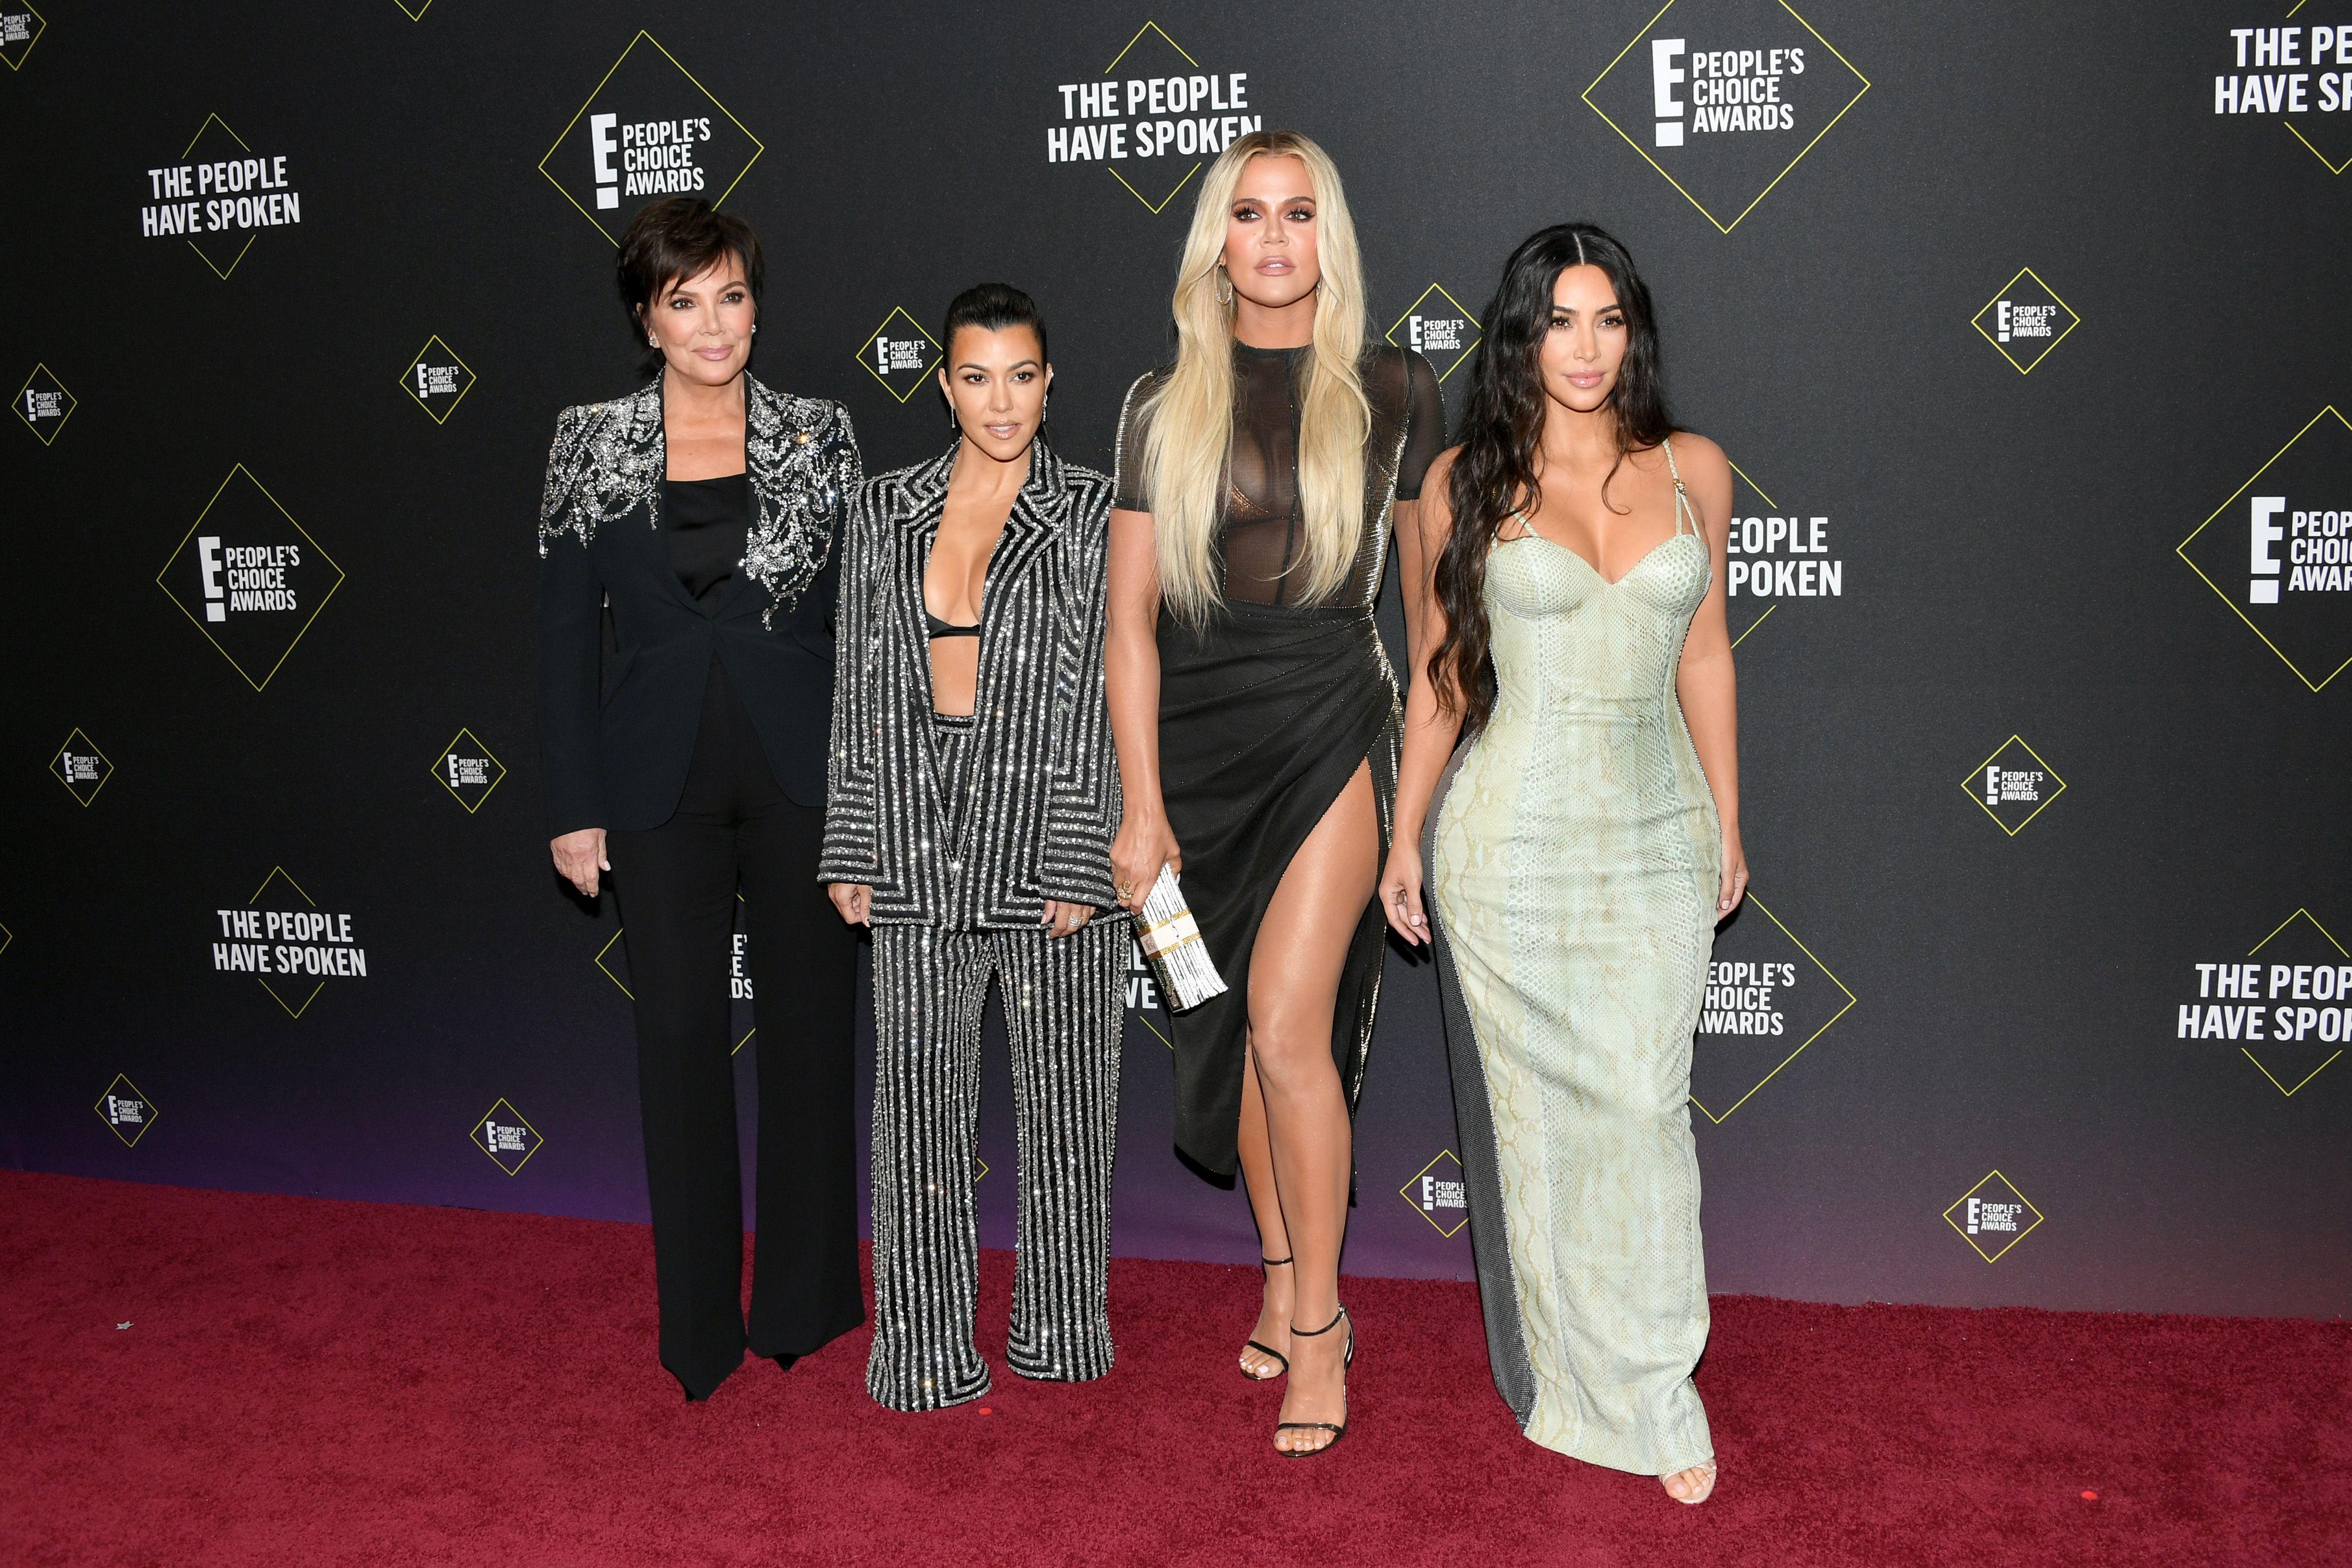 Kim and Kourtney Kardashian's awkward People's Choice Awards red carpet moment